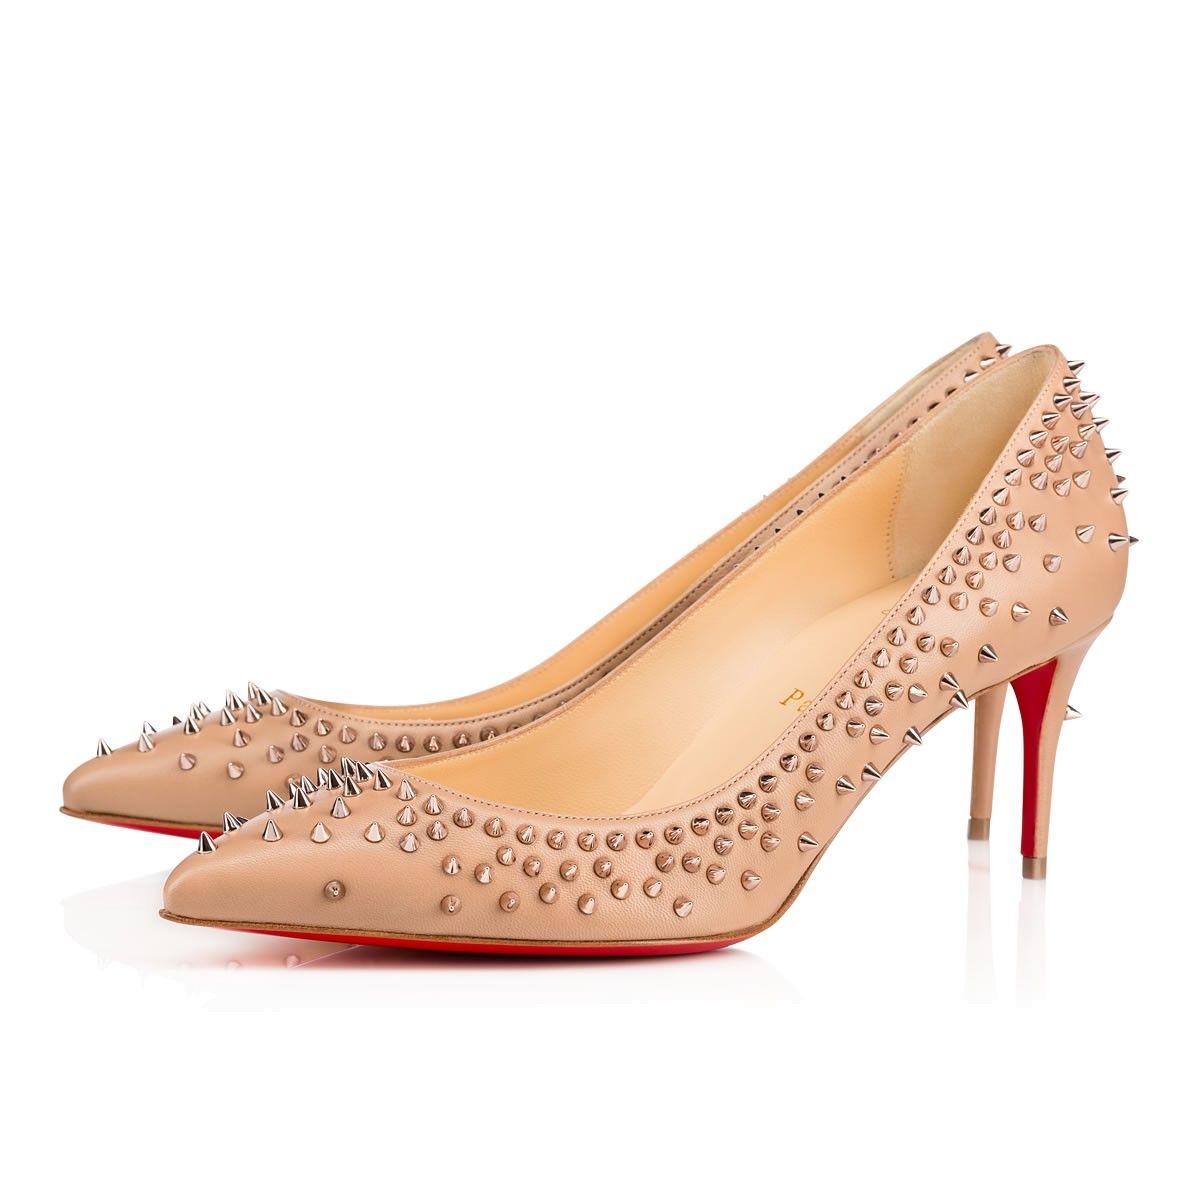 d266ad2fe2dc CHRISTIAN LOUBOUTIN Escarpic 70 Nude Rose Gold Leather - Women Shoes - Christian  Louboutin.  christianlouboutin  shoes